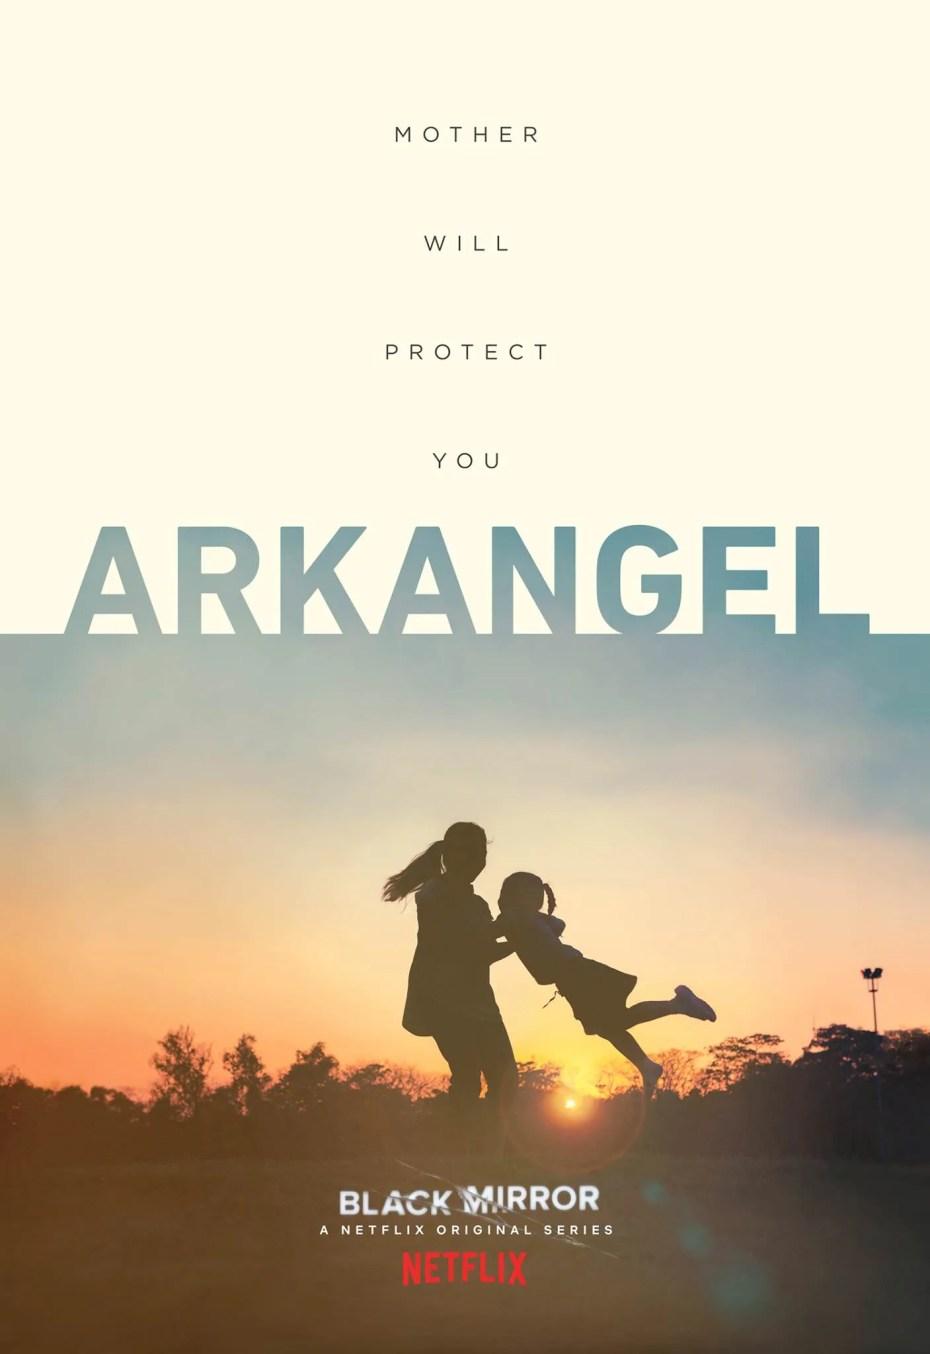 Black Mirror - Arkangel